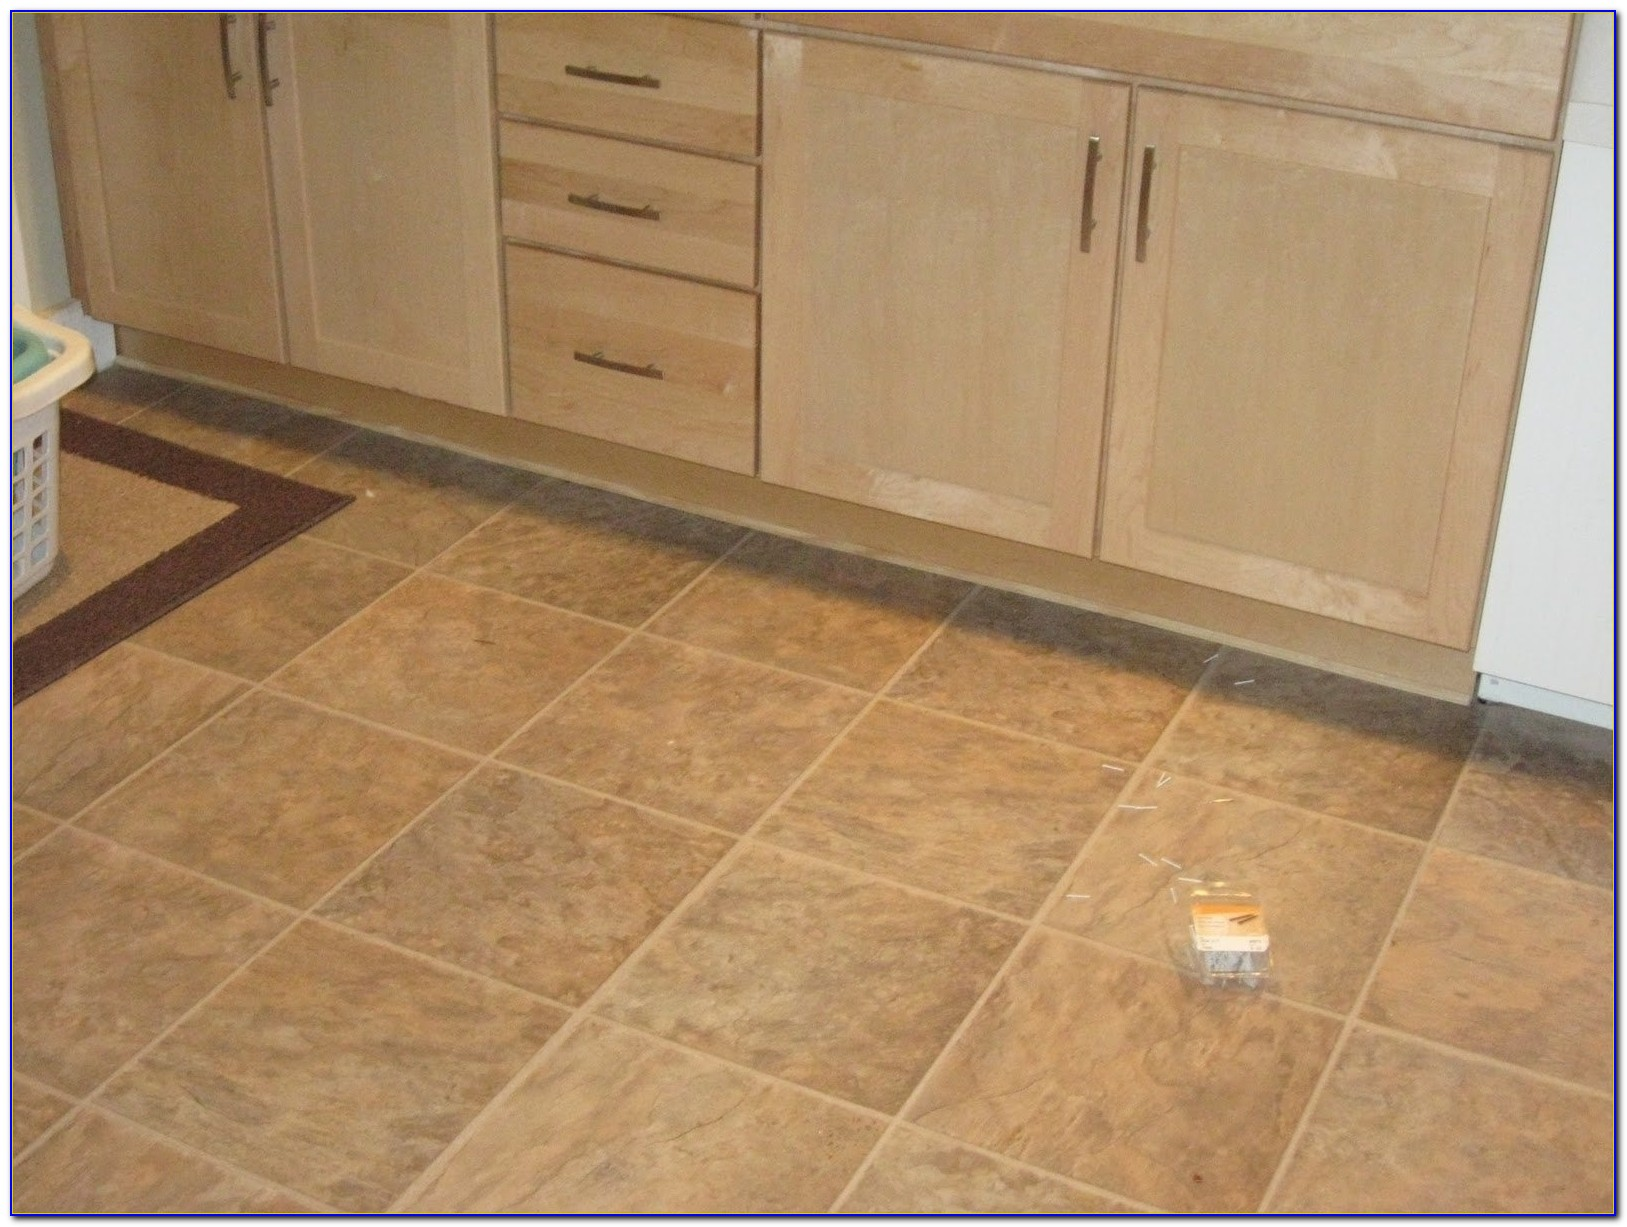 Stick On Floor Tiles For Bathroom